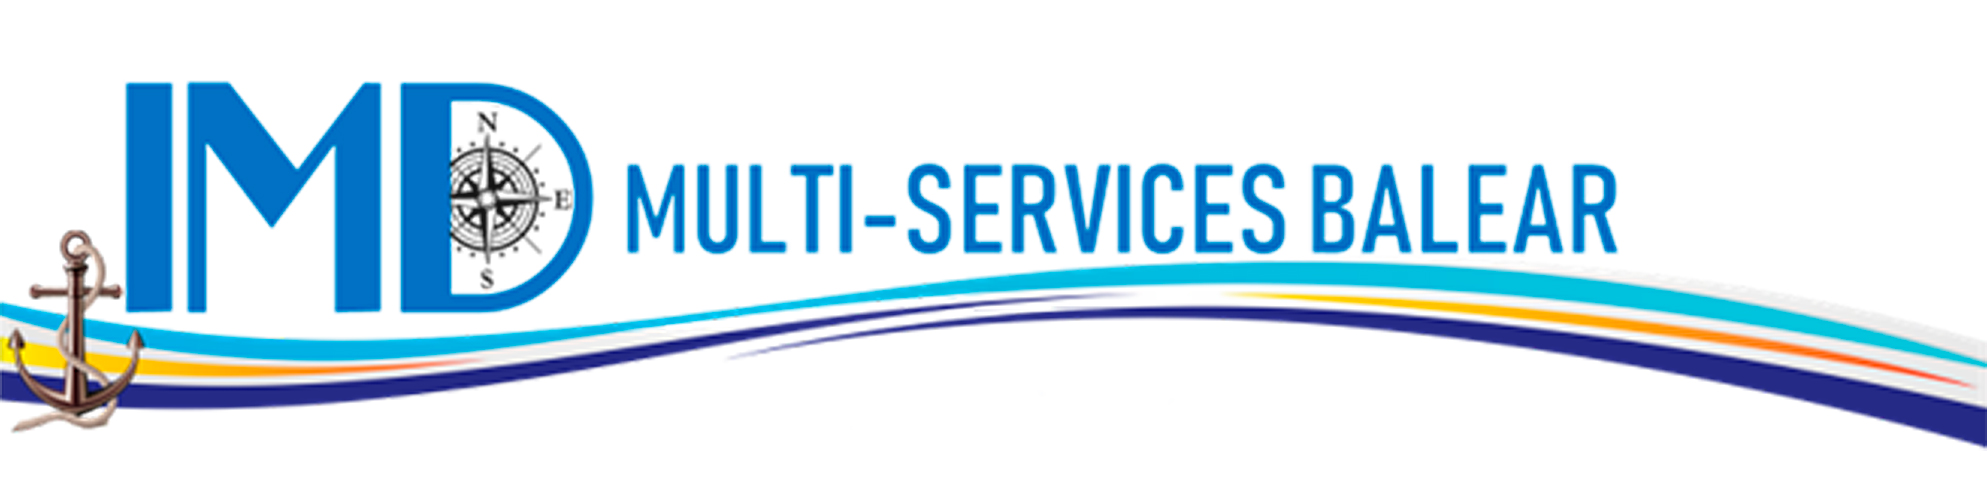 Imd Multiservices Balear